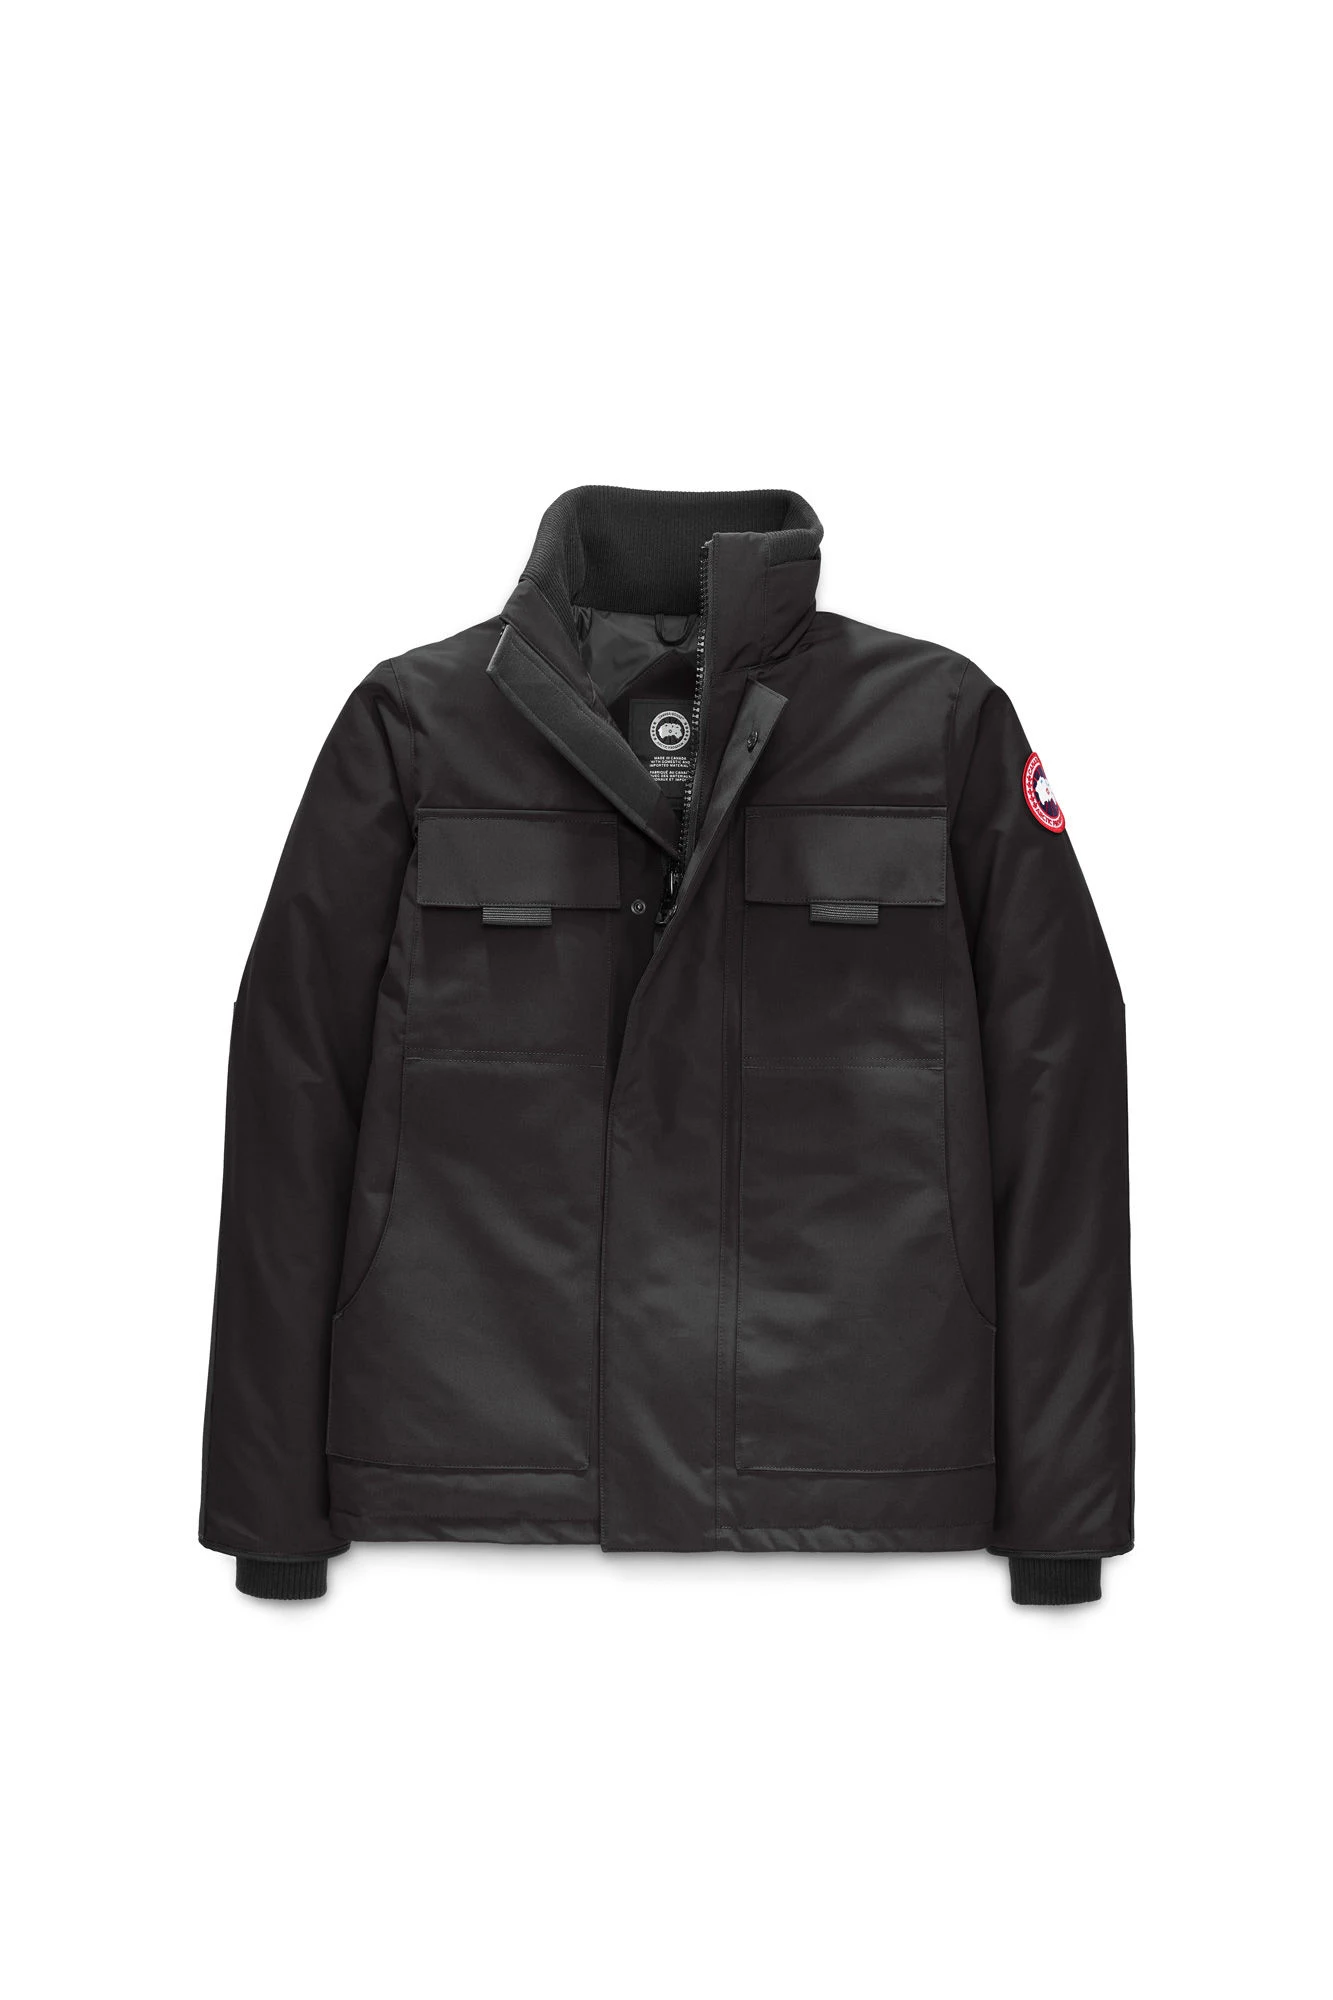 Canada Goose M Forester Jacket Black